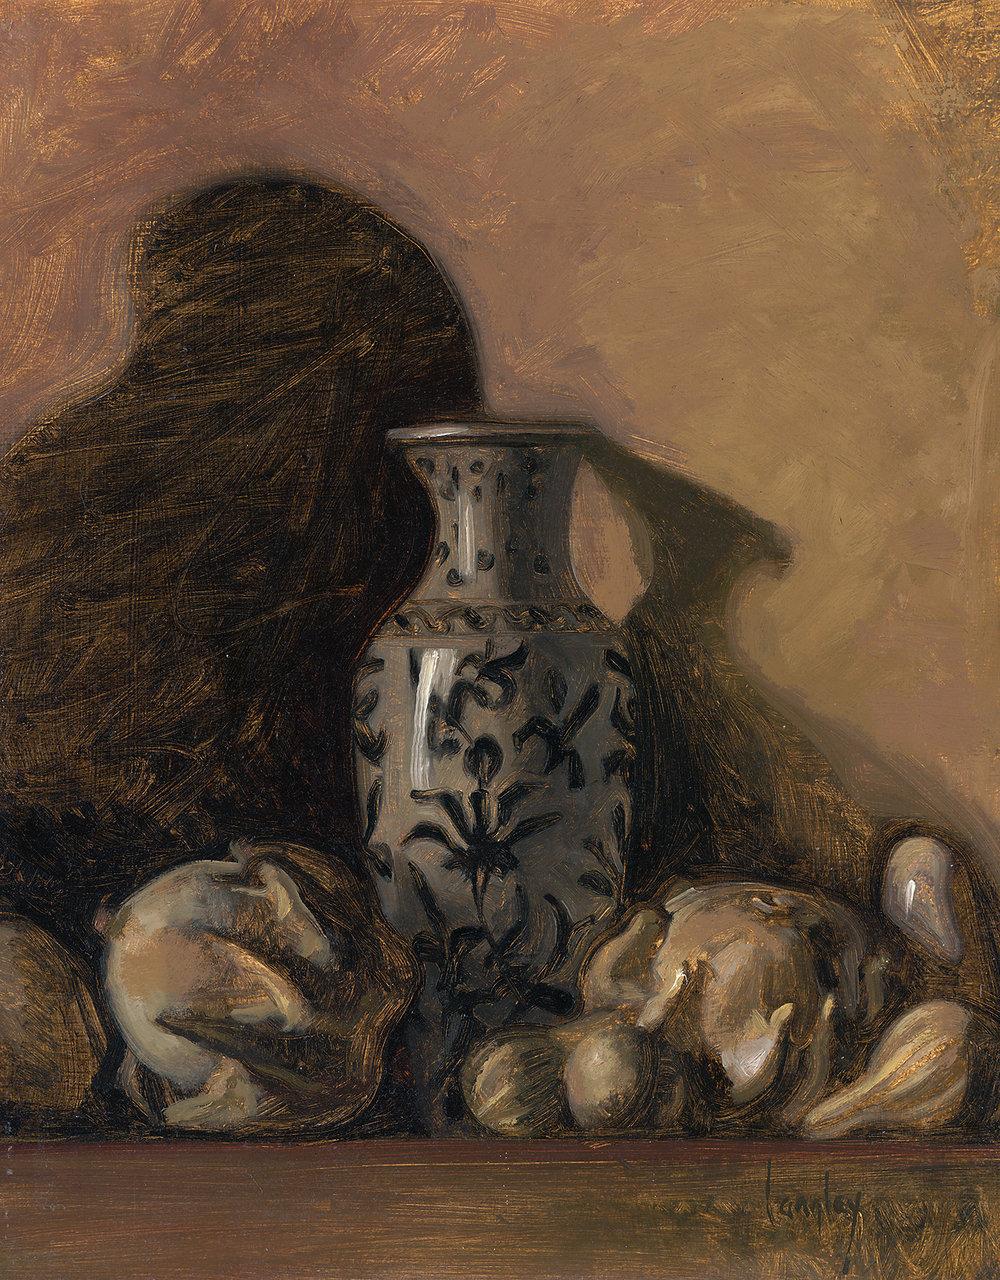 langley vase & gourds.jpg